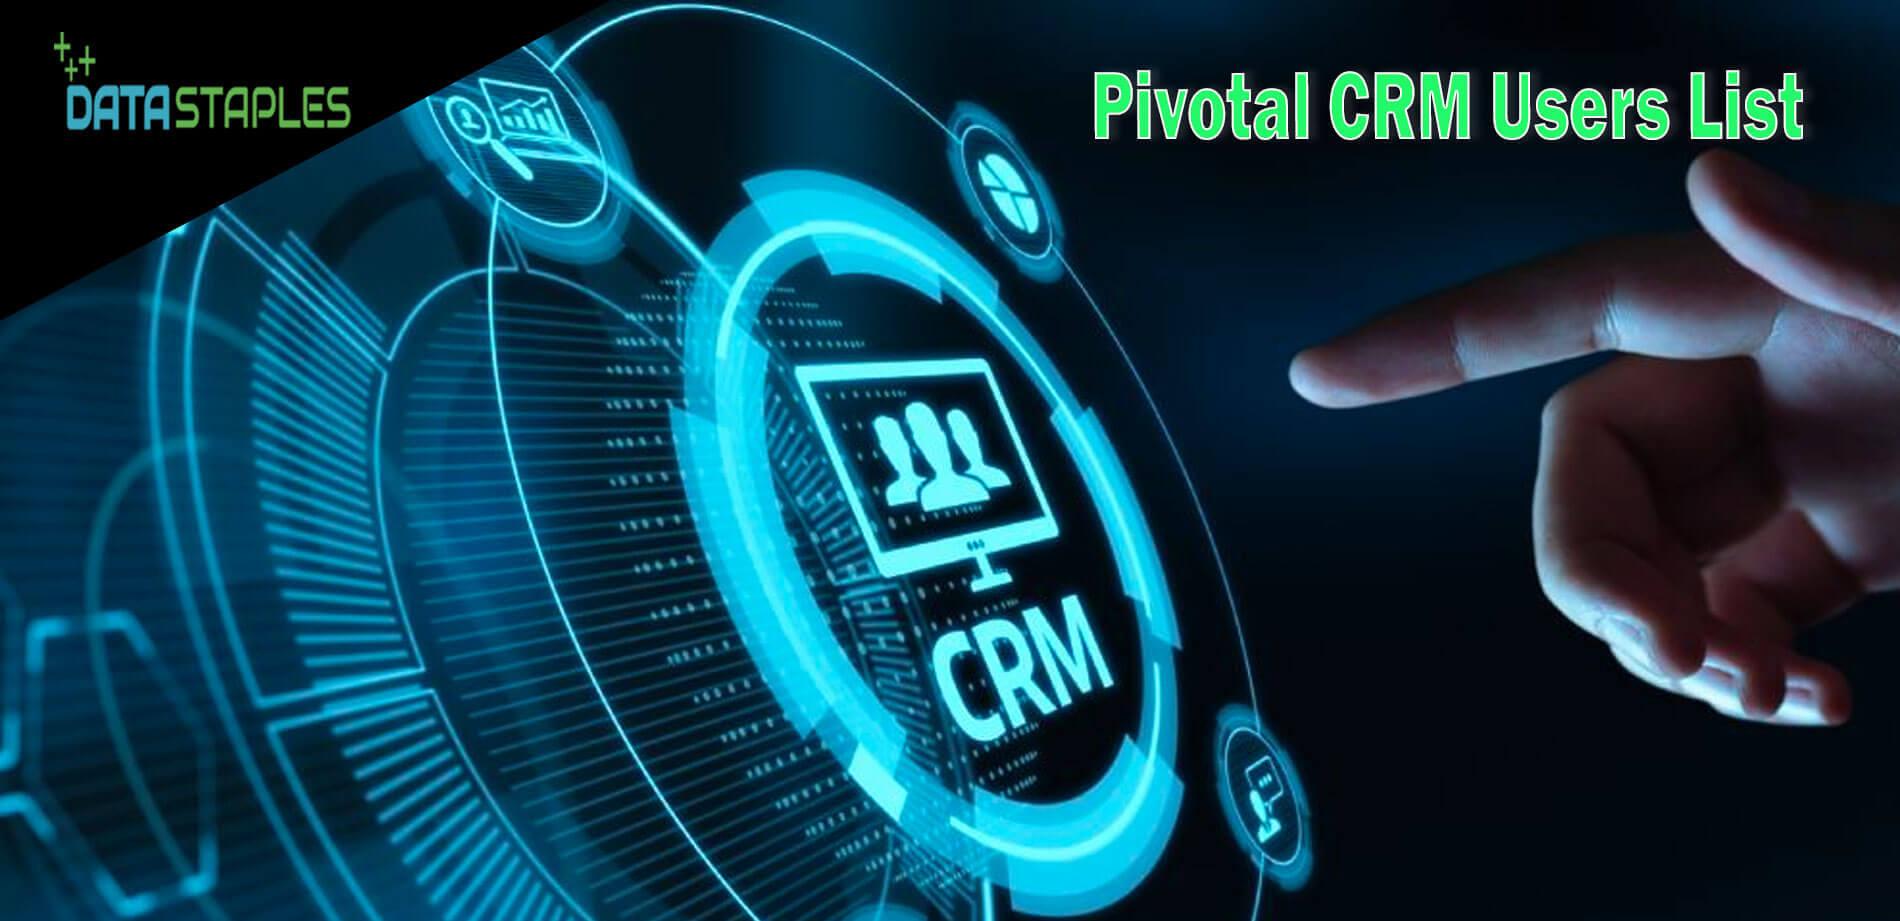 Pivotal CRM Users List | DataStaples